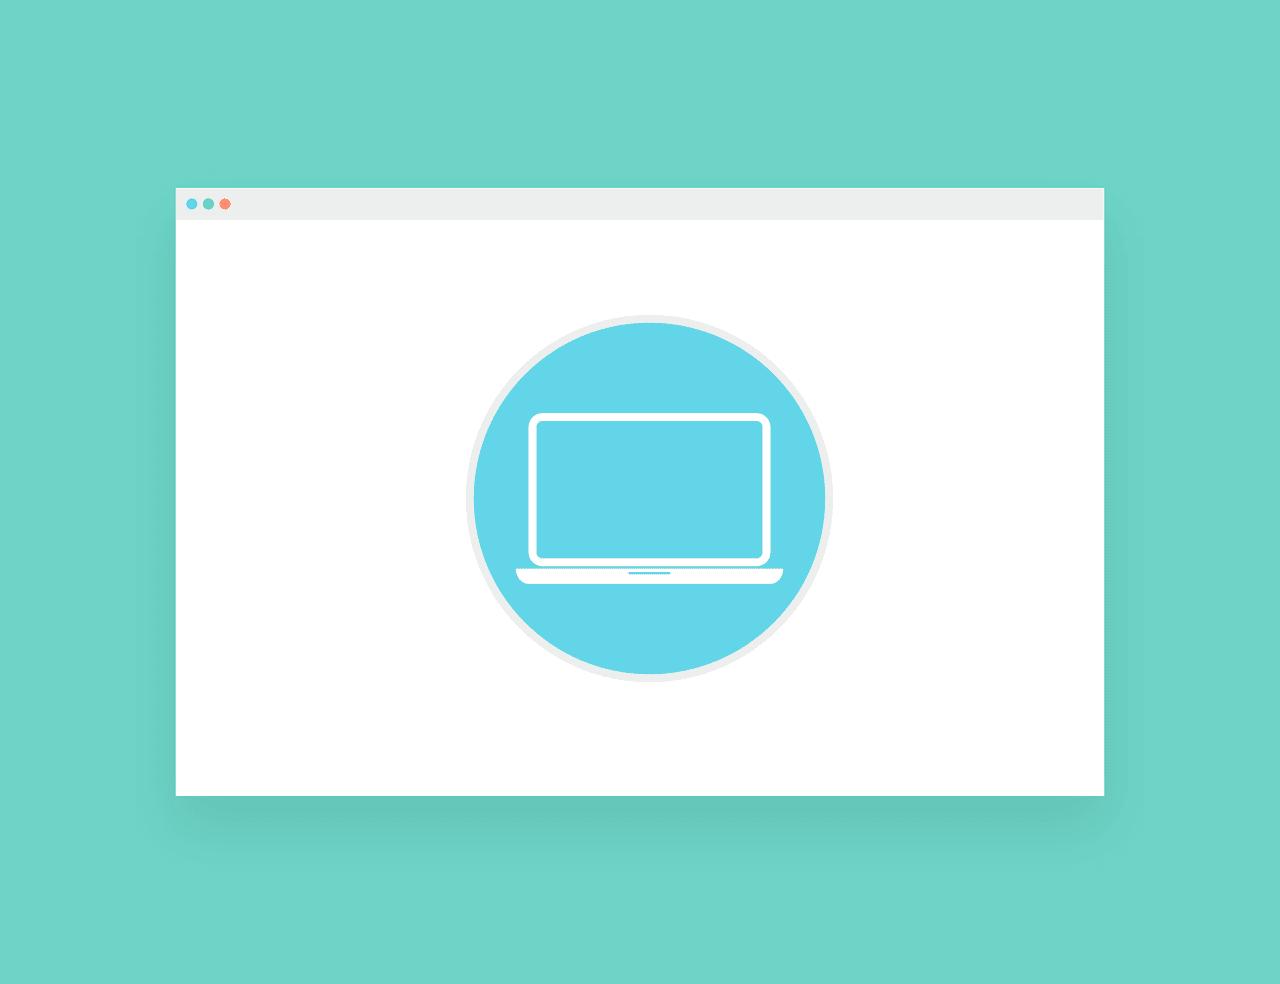 Tampilan Windows Zoom Setelah Install Ulang